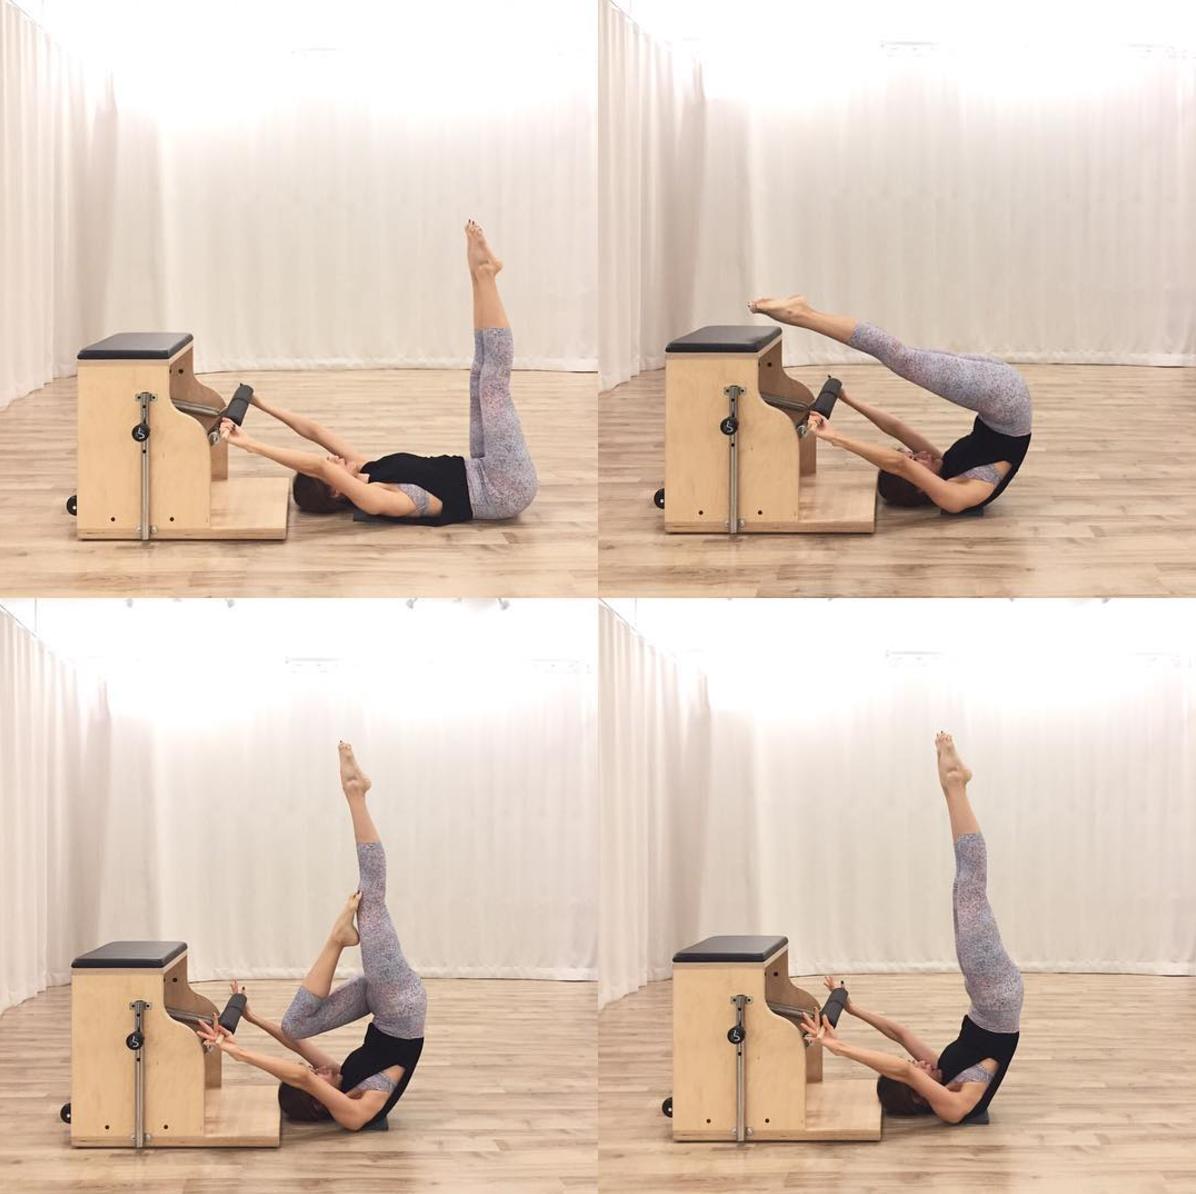 Pilates Combo Pilates Chair Pre Built: The Balance Studio - T.081 6600 864